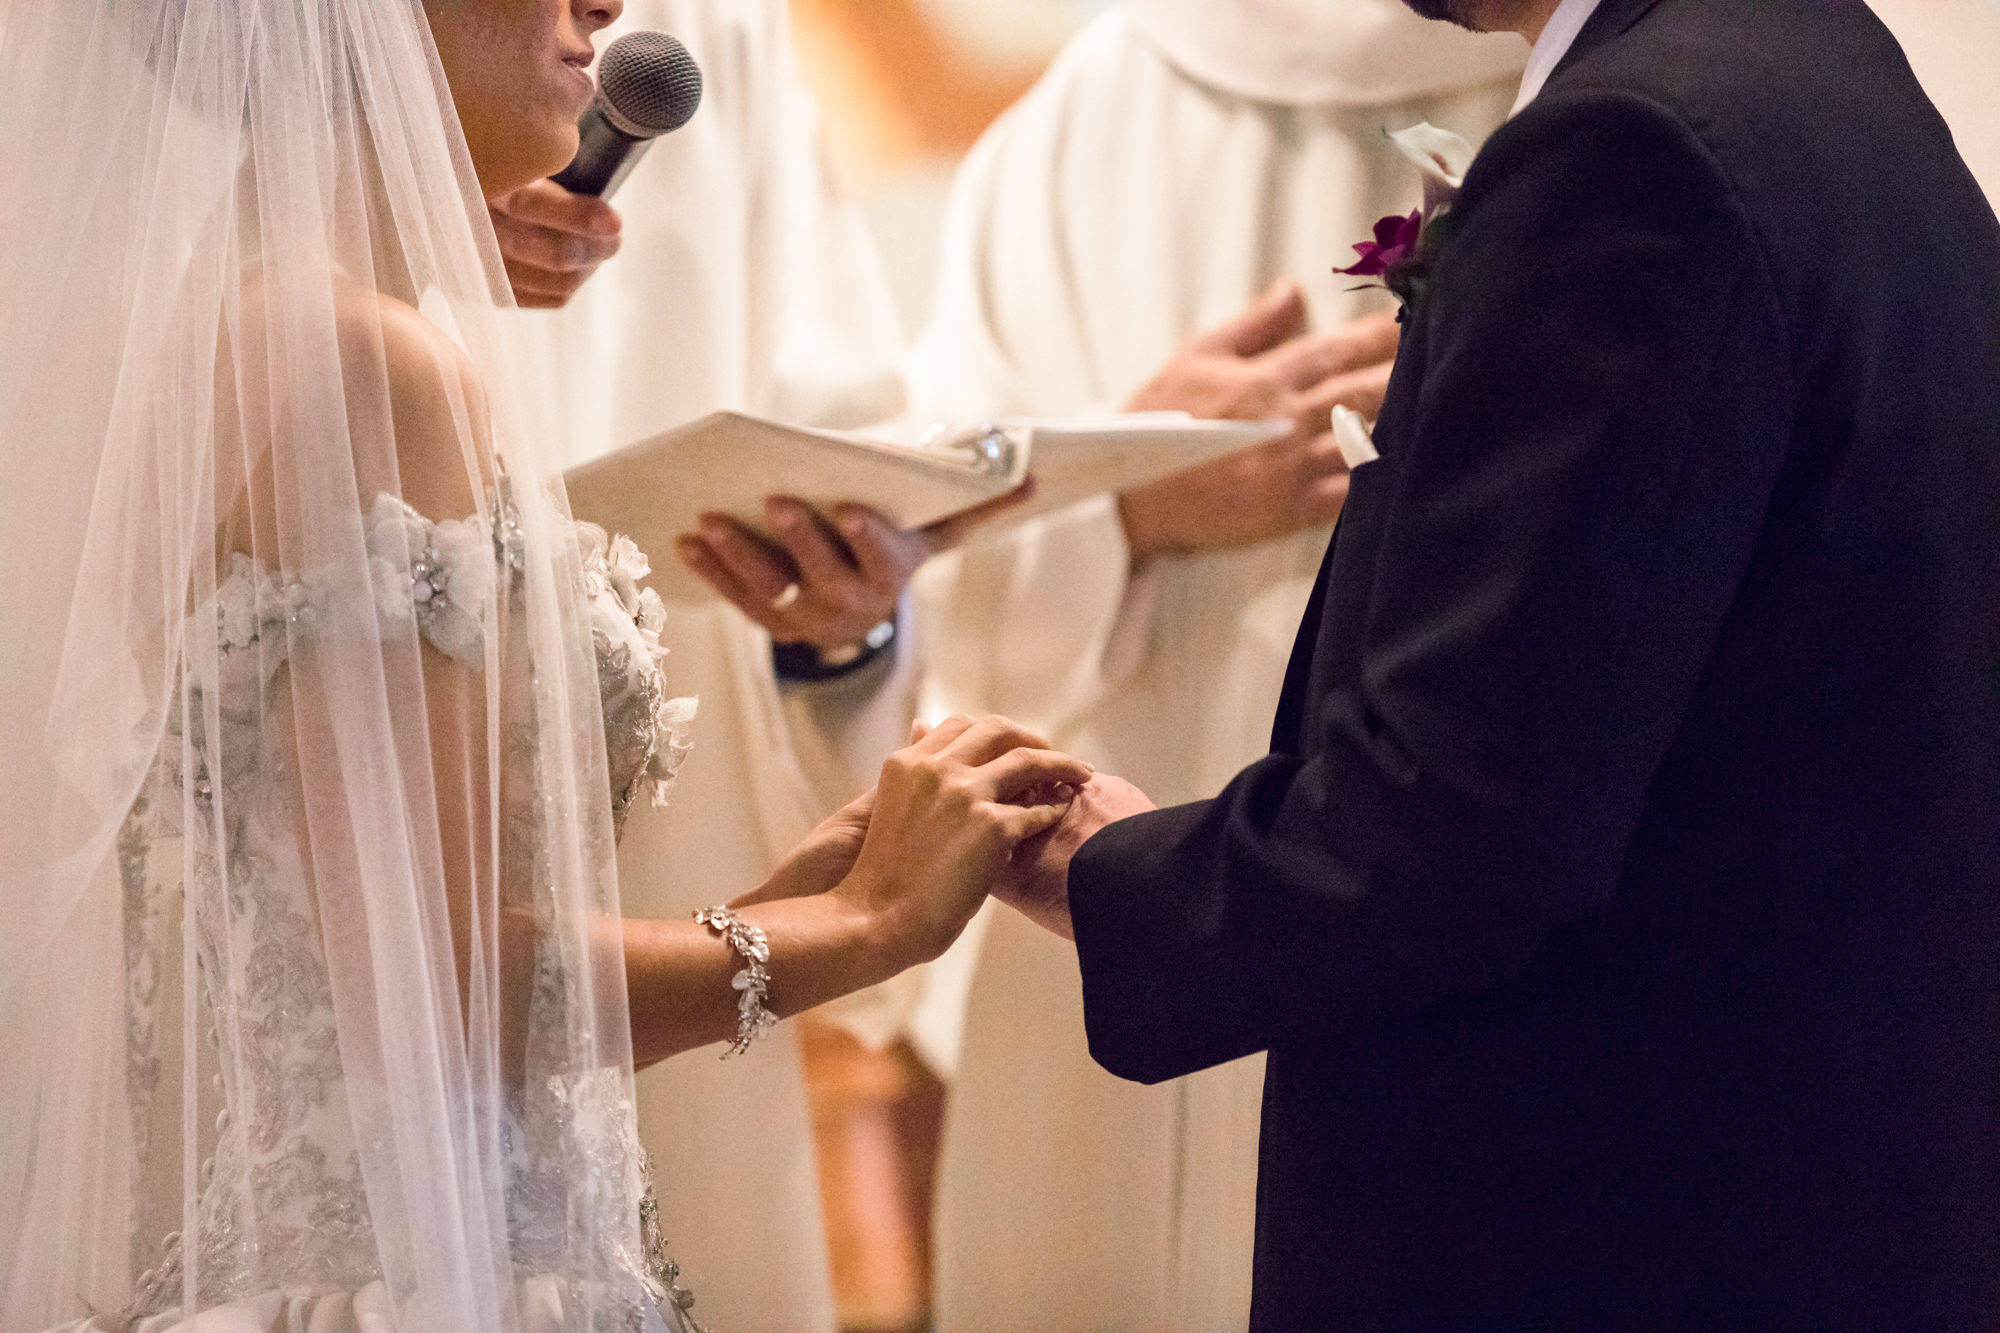 Benvenuto_Wedding_catholic_Florida_Bride-Groom-46.jpg